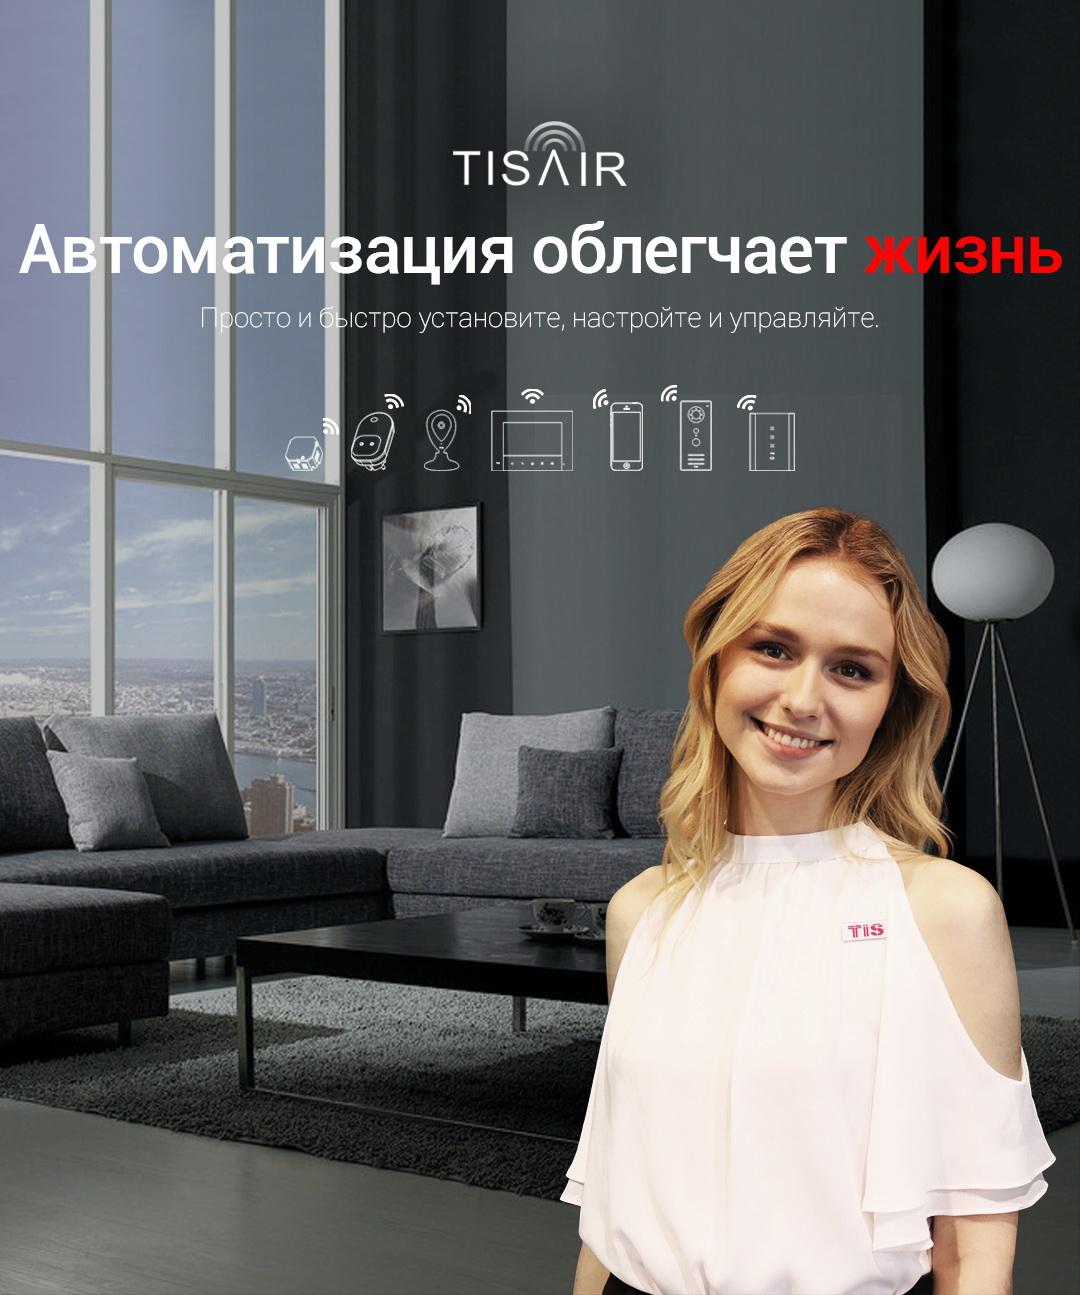 TIS AIR – автоматизация через WiFi стала проще